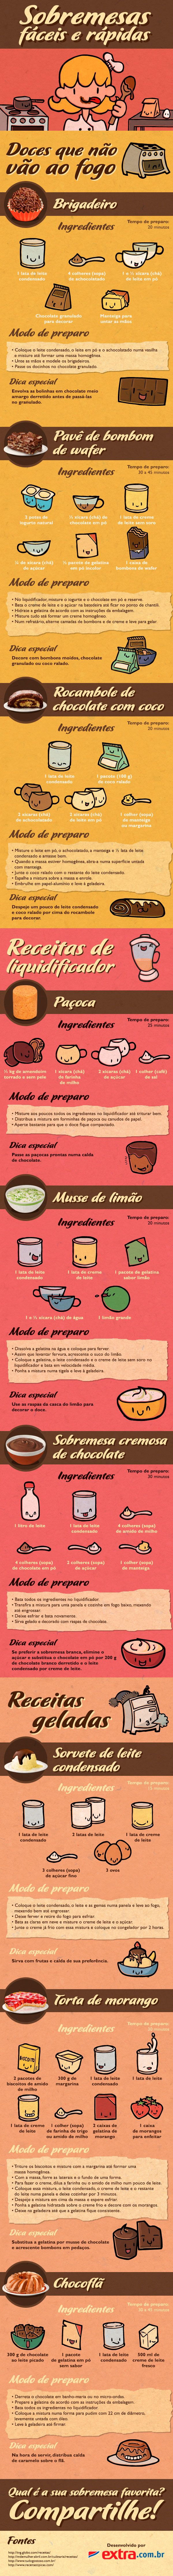 Infográfico - Receitas de Sobremesas Fáceis e Rápidas